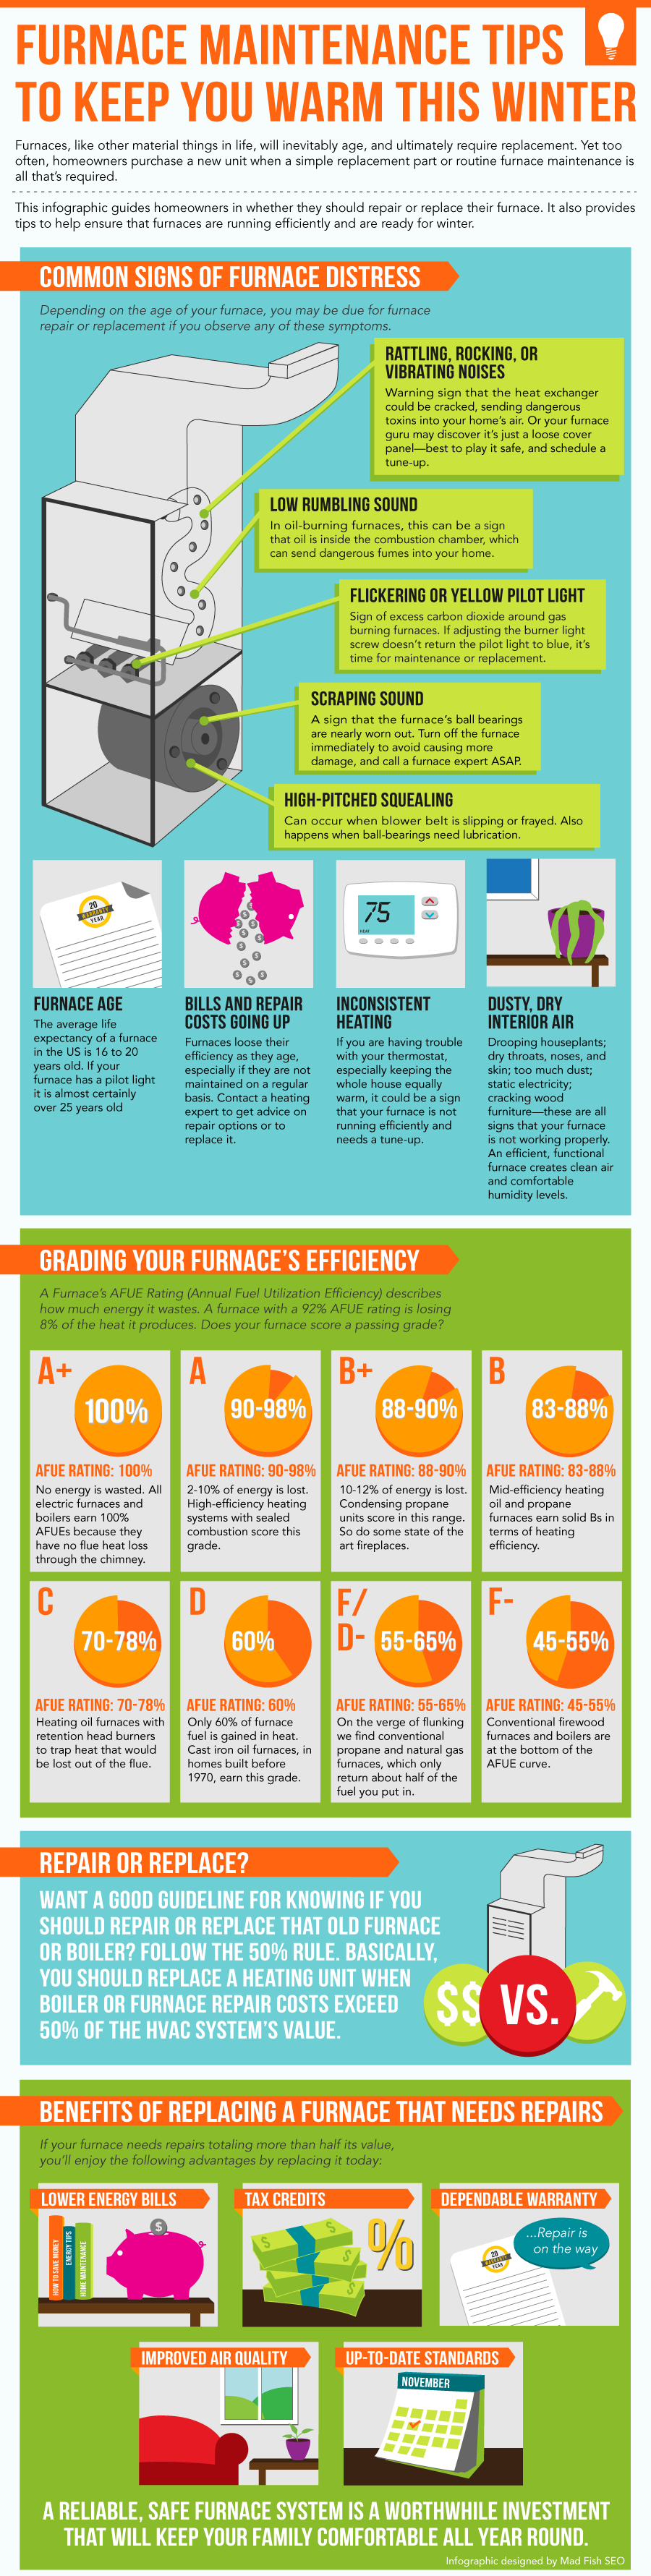 Pre-Season Heating Maintenance | GSK Climate Control, Inc.